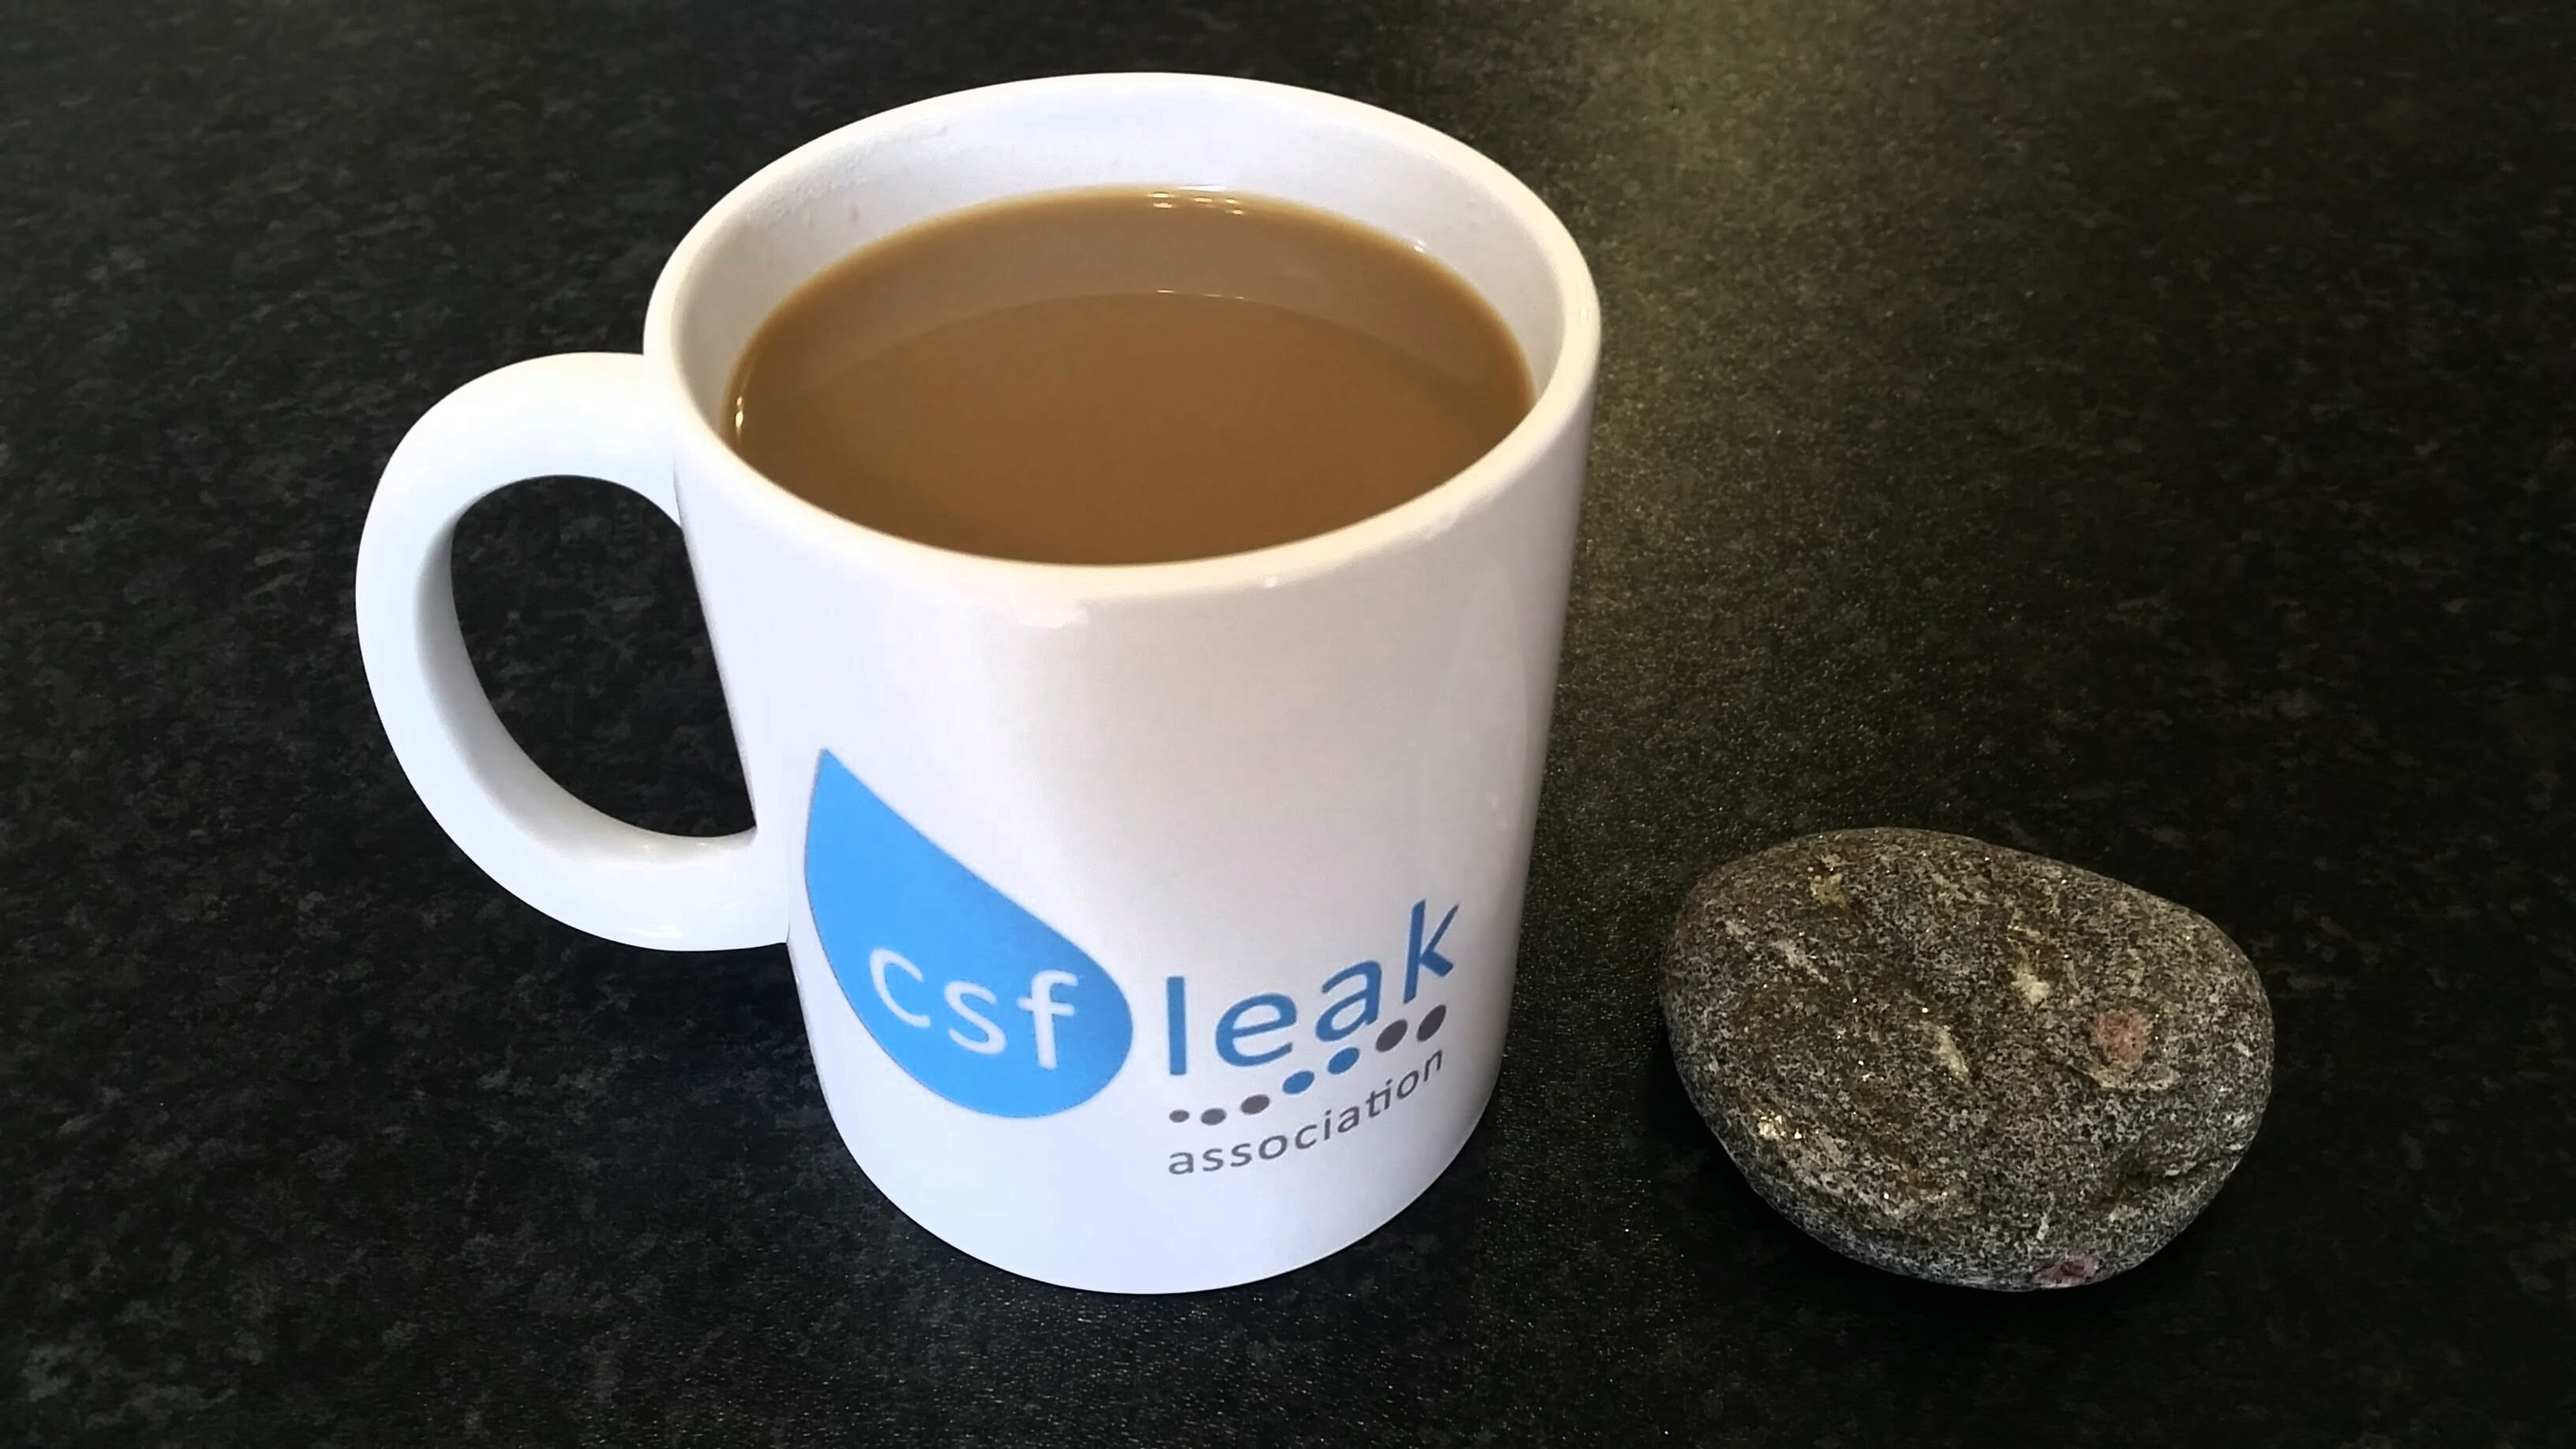 CSF Leak Association Mug